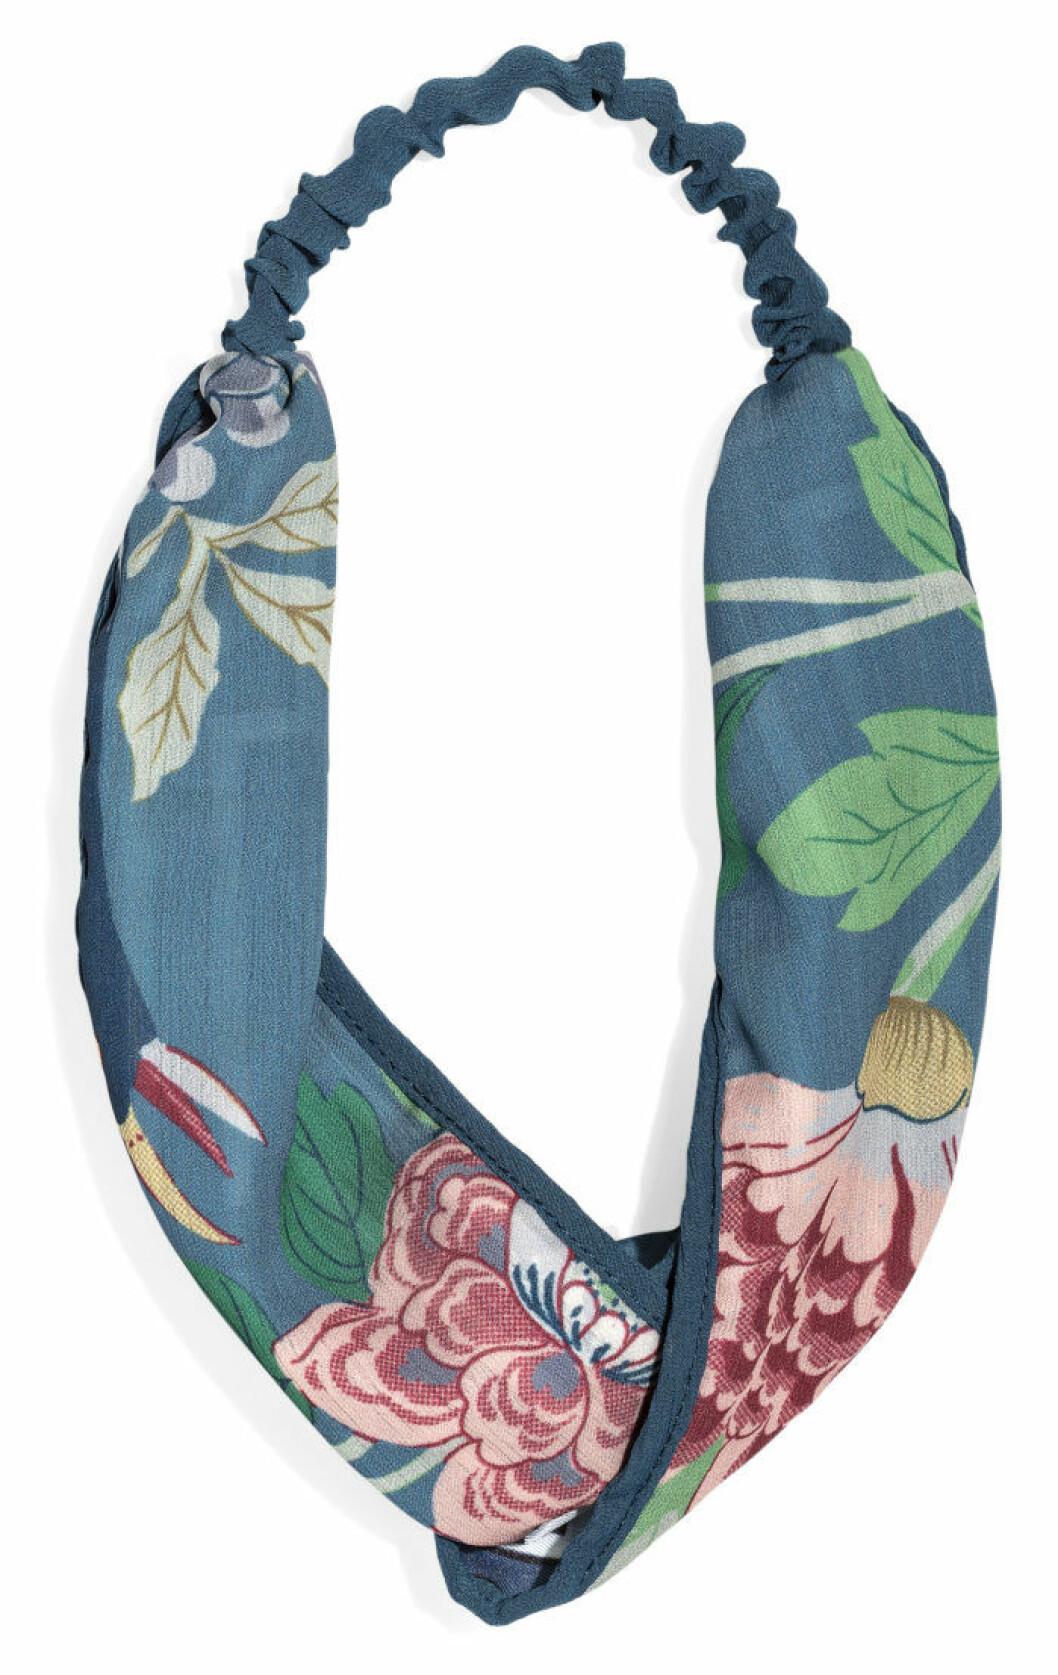 H&M GP & J Baker blommönstrat hårband